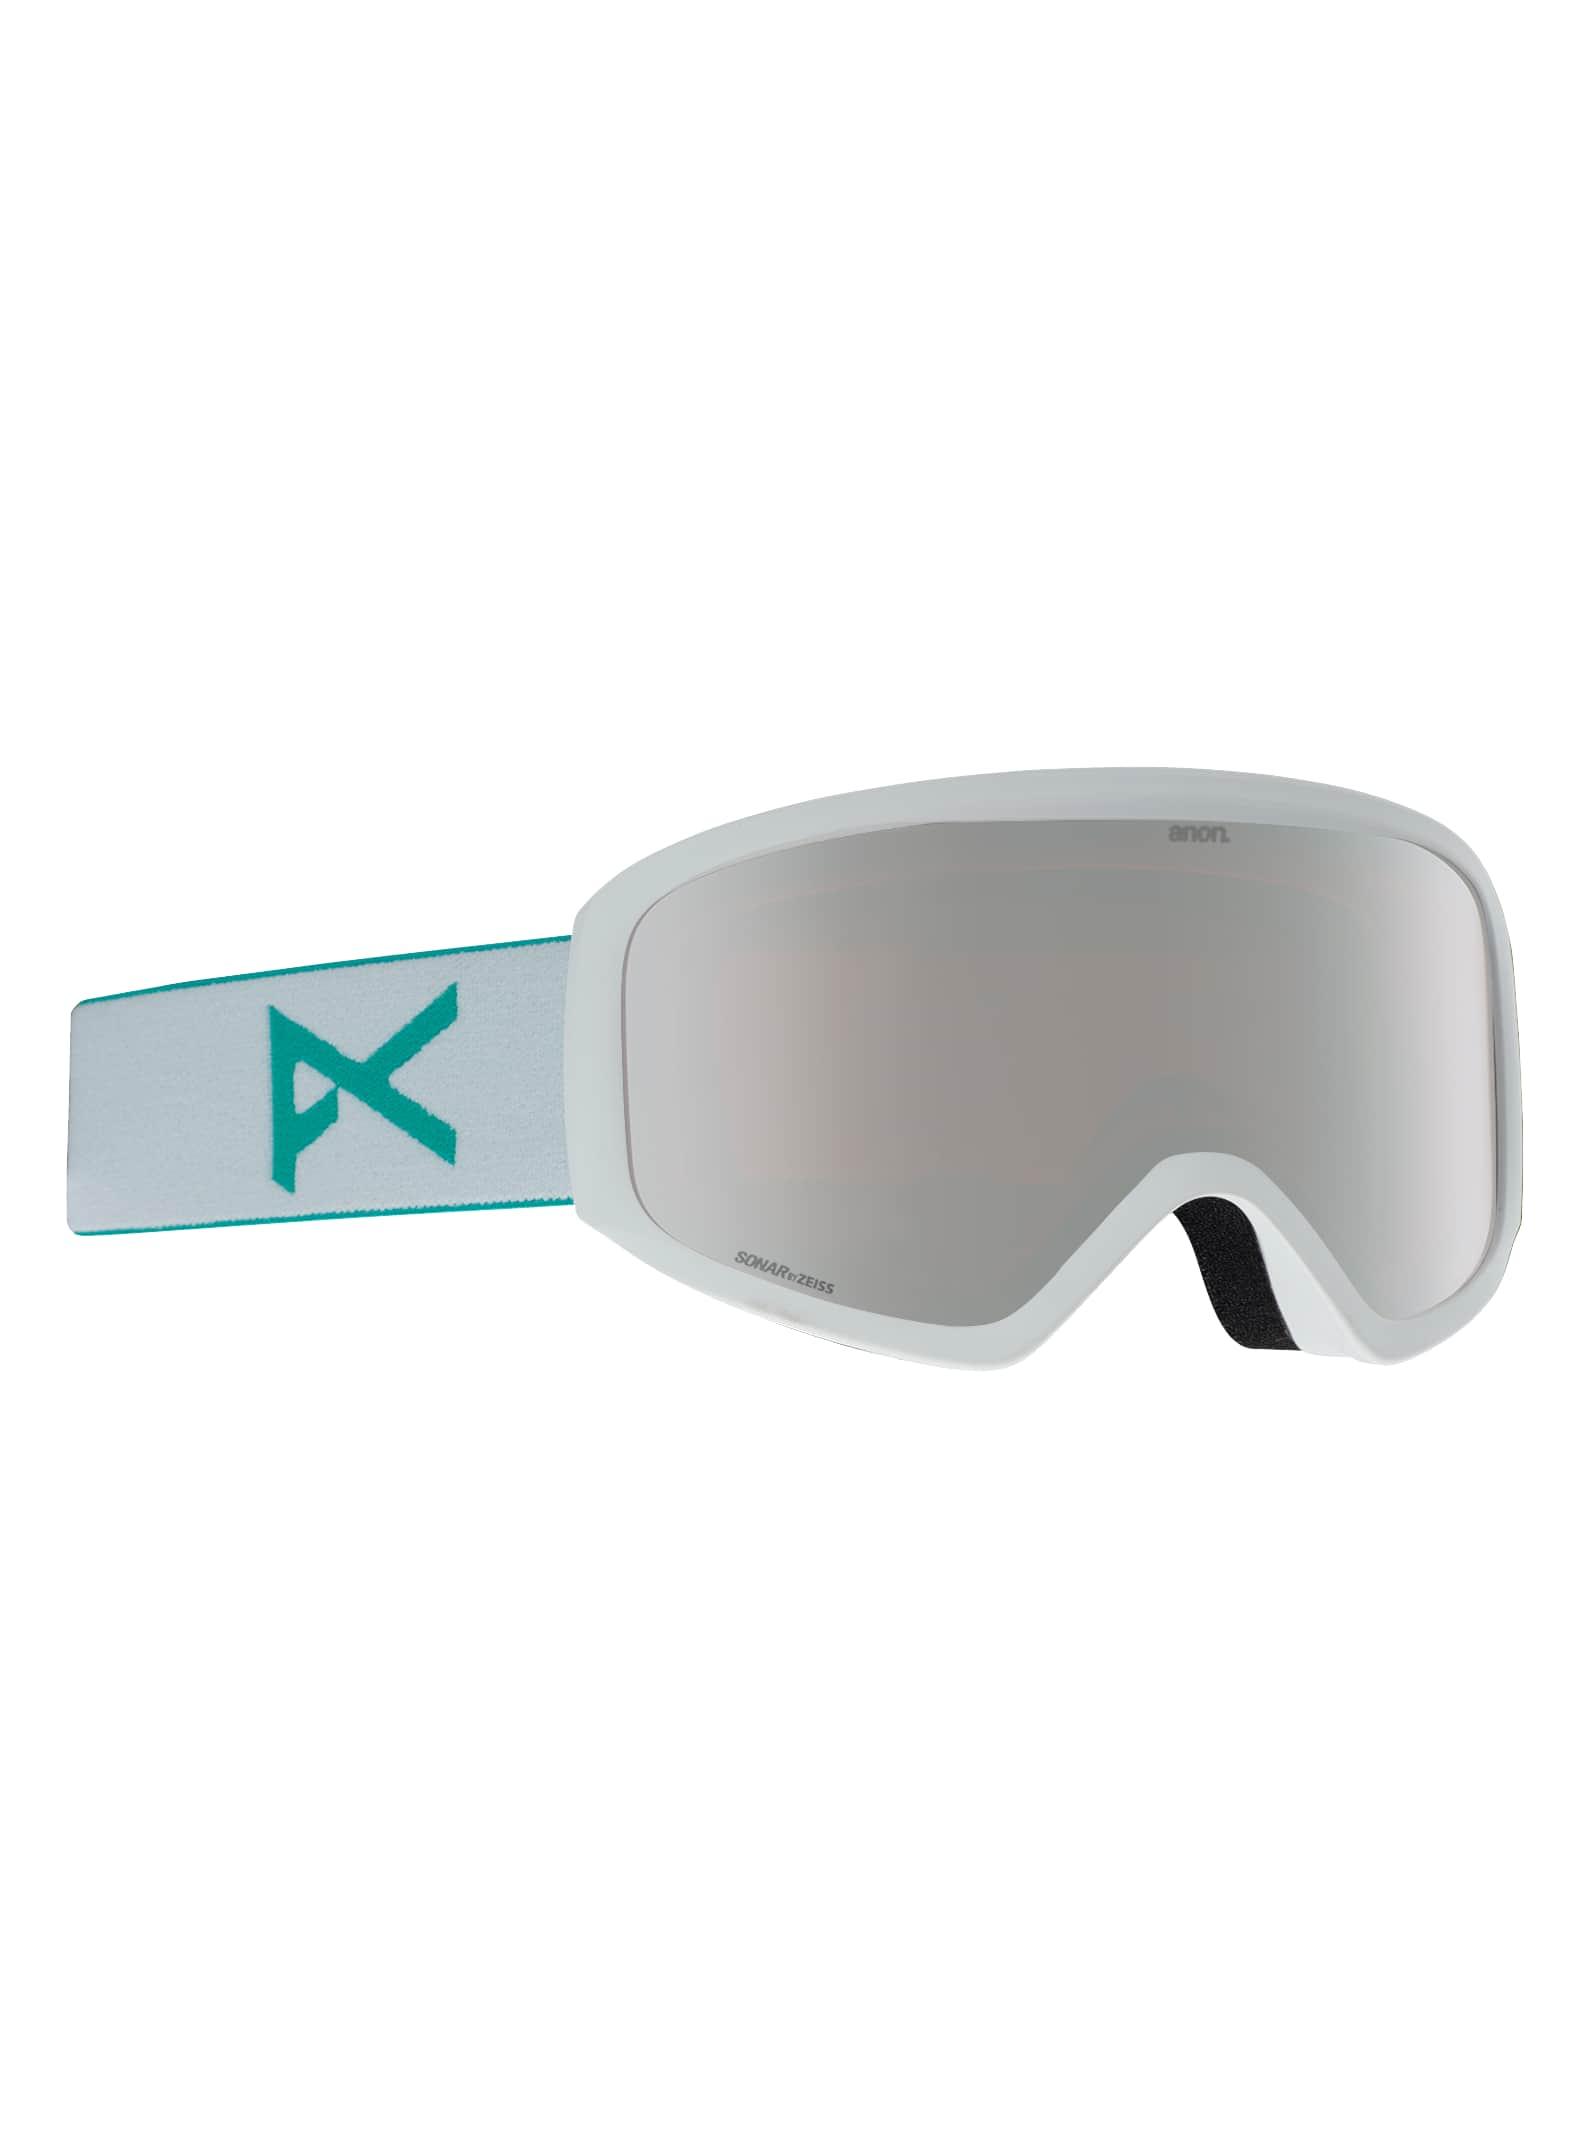 dd9f65935aaf Women s Anon Insight Sonar Goggle + Spare Lens